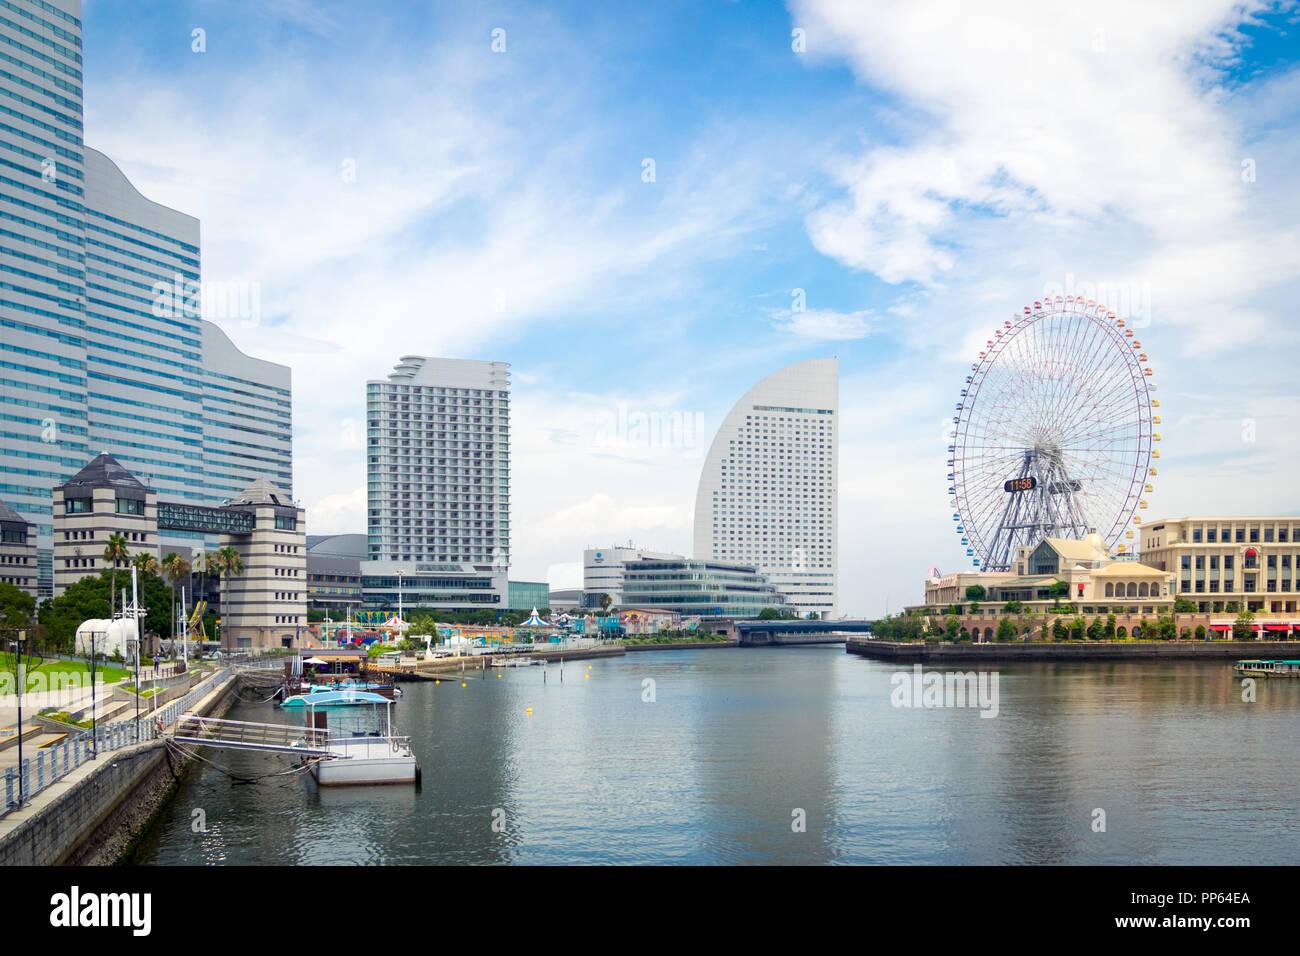 The beautiful Yokohama skyline and Yokohama waterfront at Minato-Mirai, and the Cosmo Clock 21 Ferris wheel Yokohama, Kanagawa Prefecture, Japan. - Stock Image